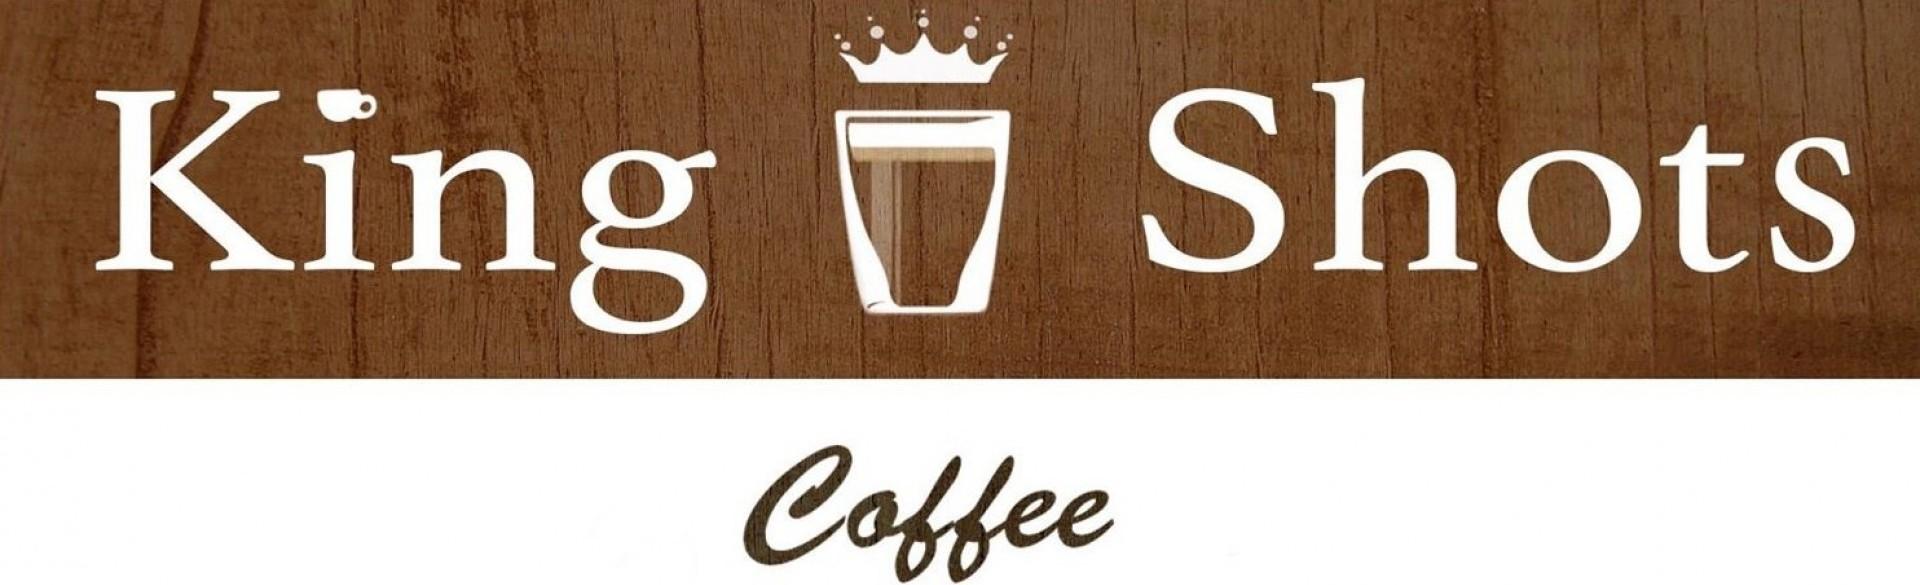 King Shots Coffee